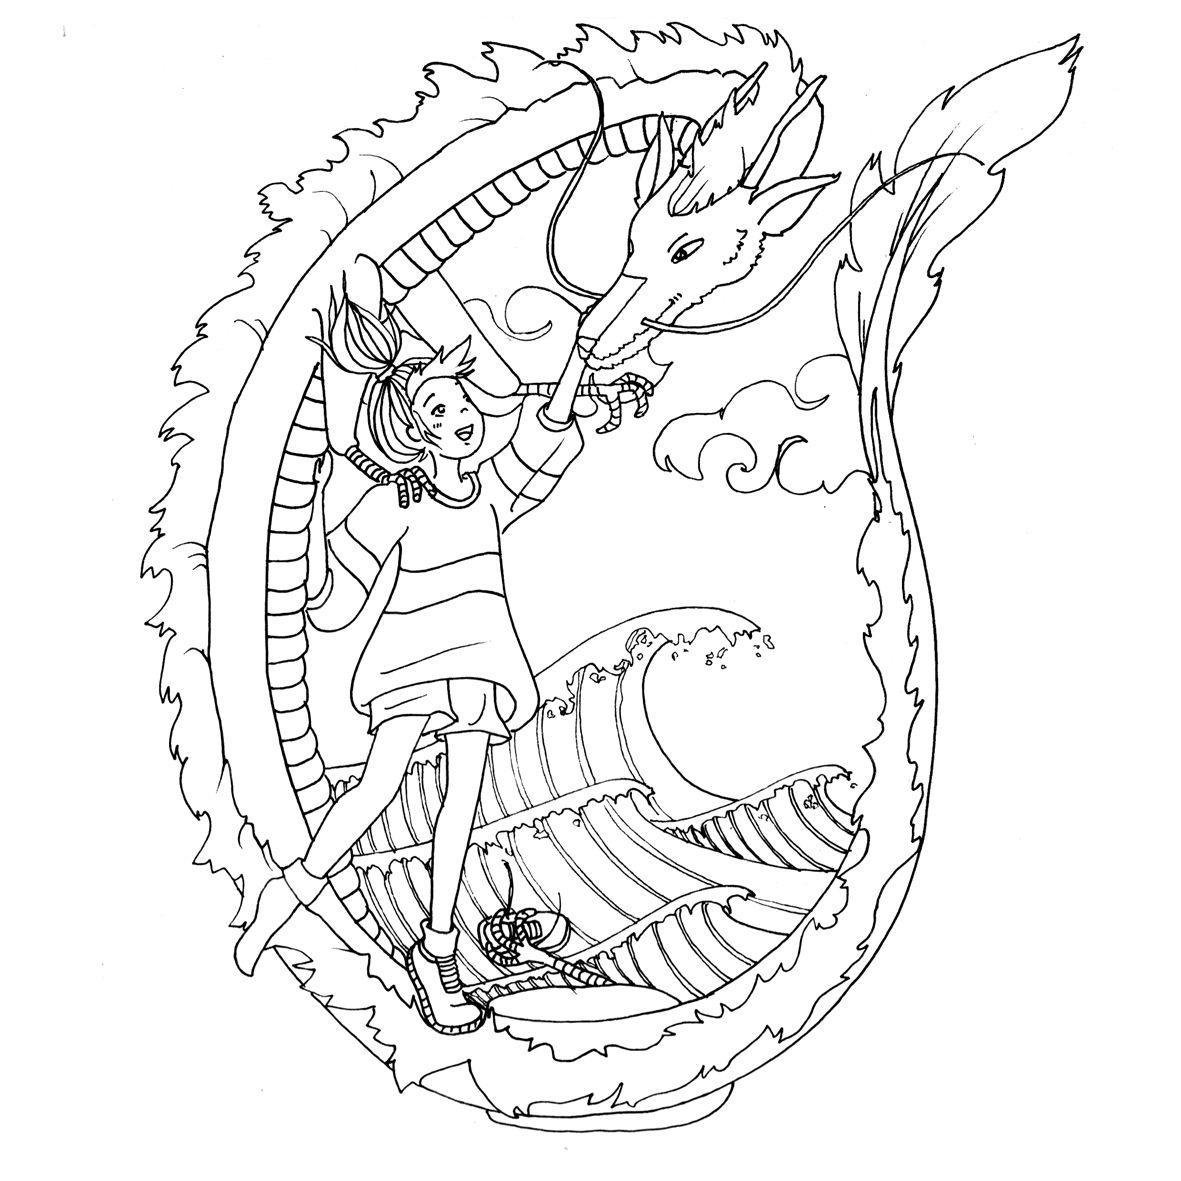 doodles and totoro  u2013 part 4